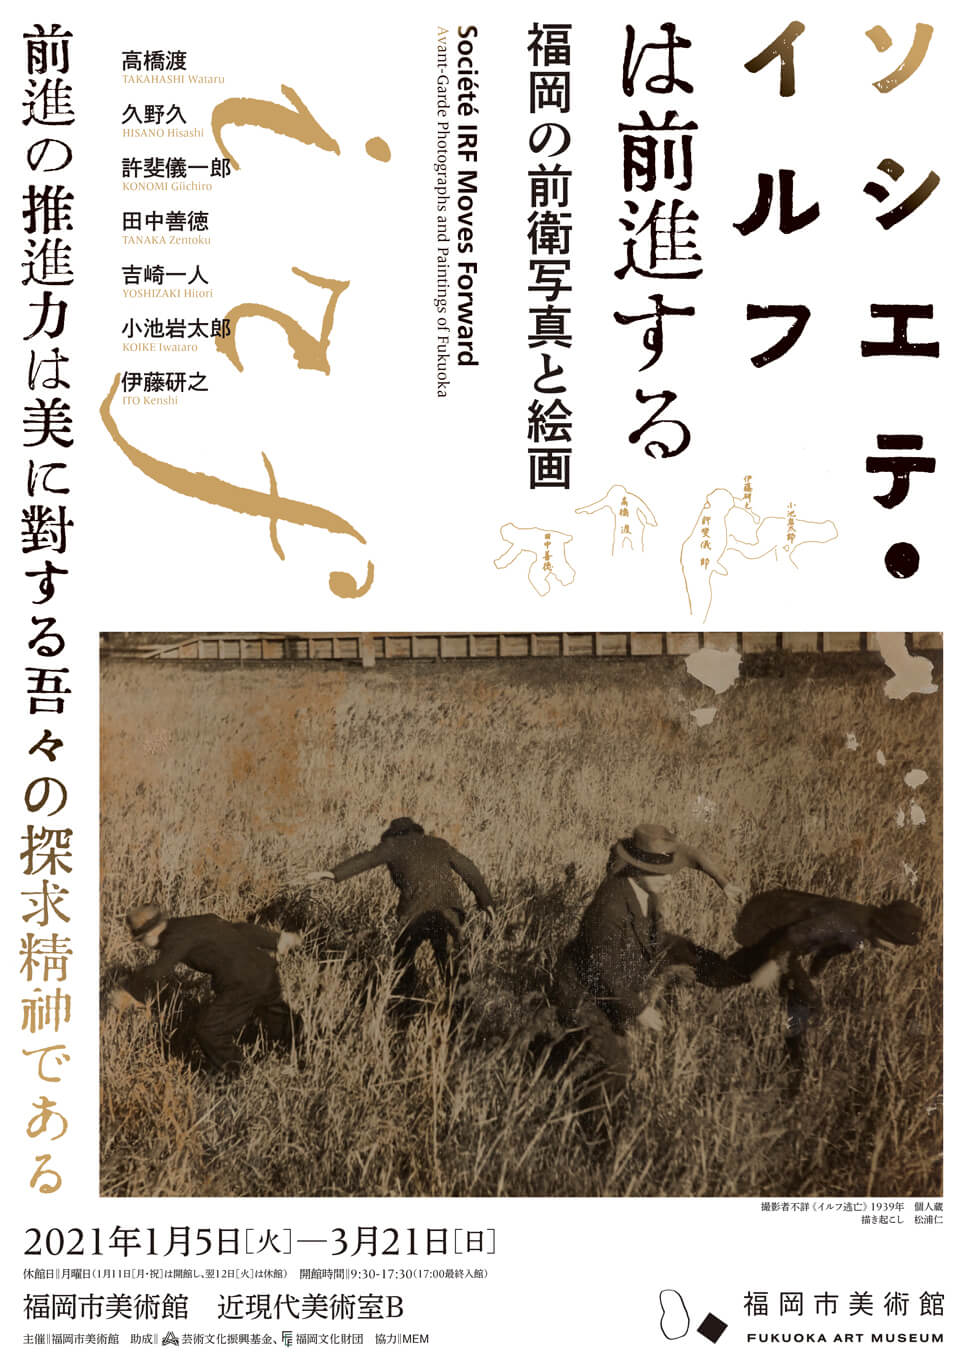 fam-202101-ソシエテ・イルフ 絵画展